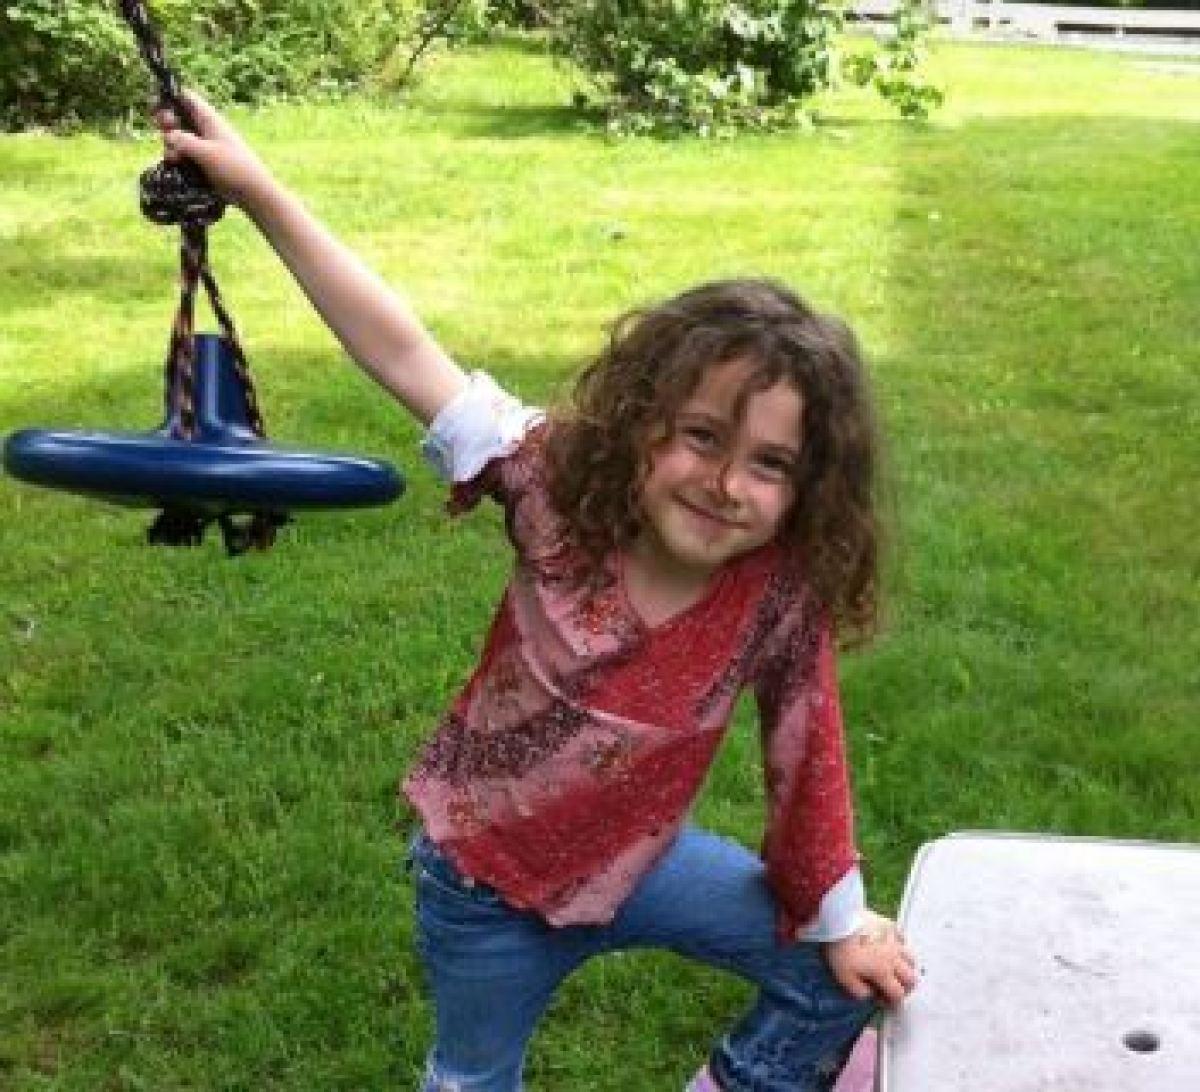 Jeremy Richman daughter